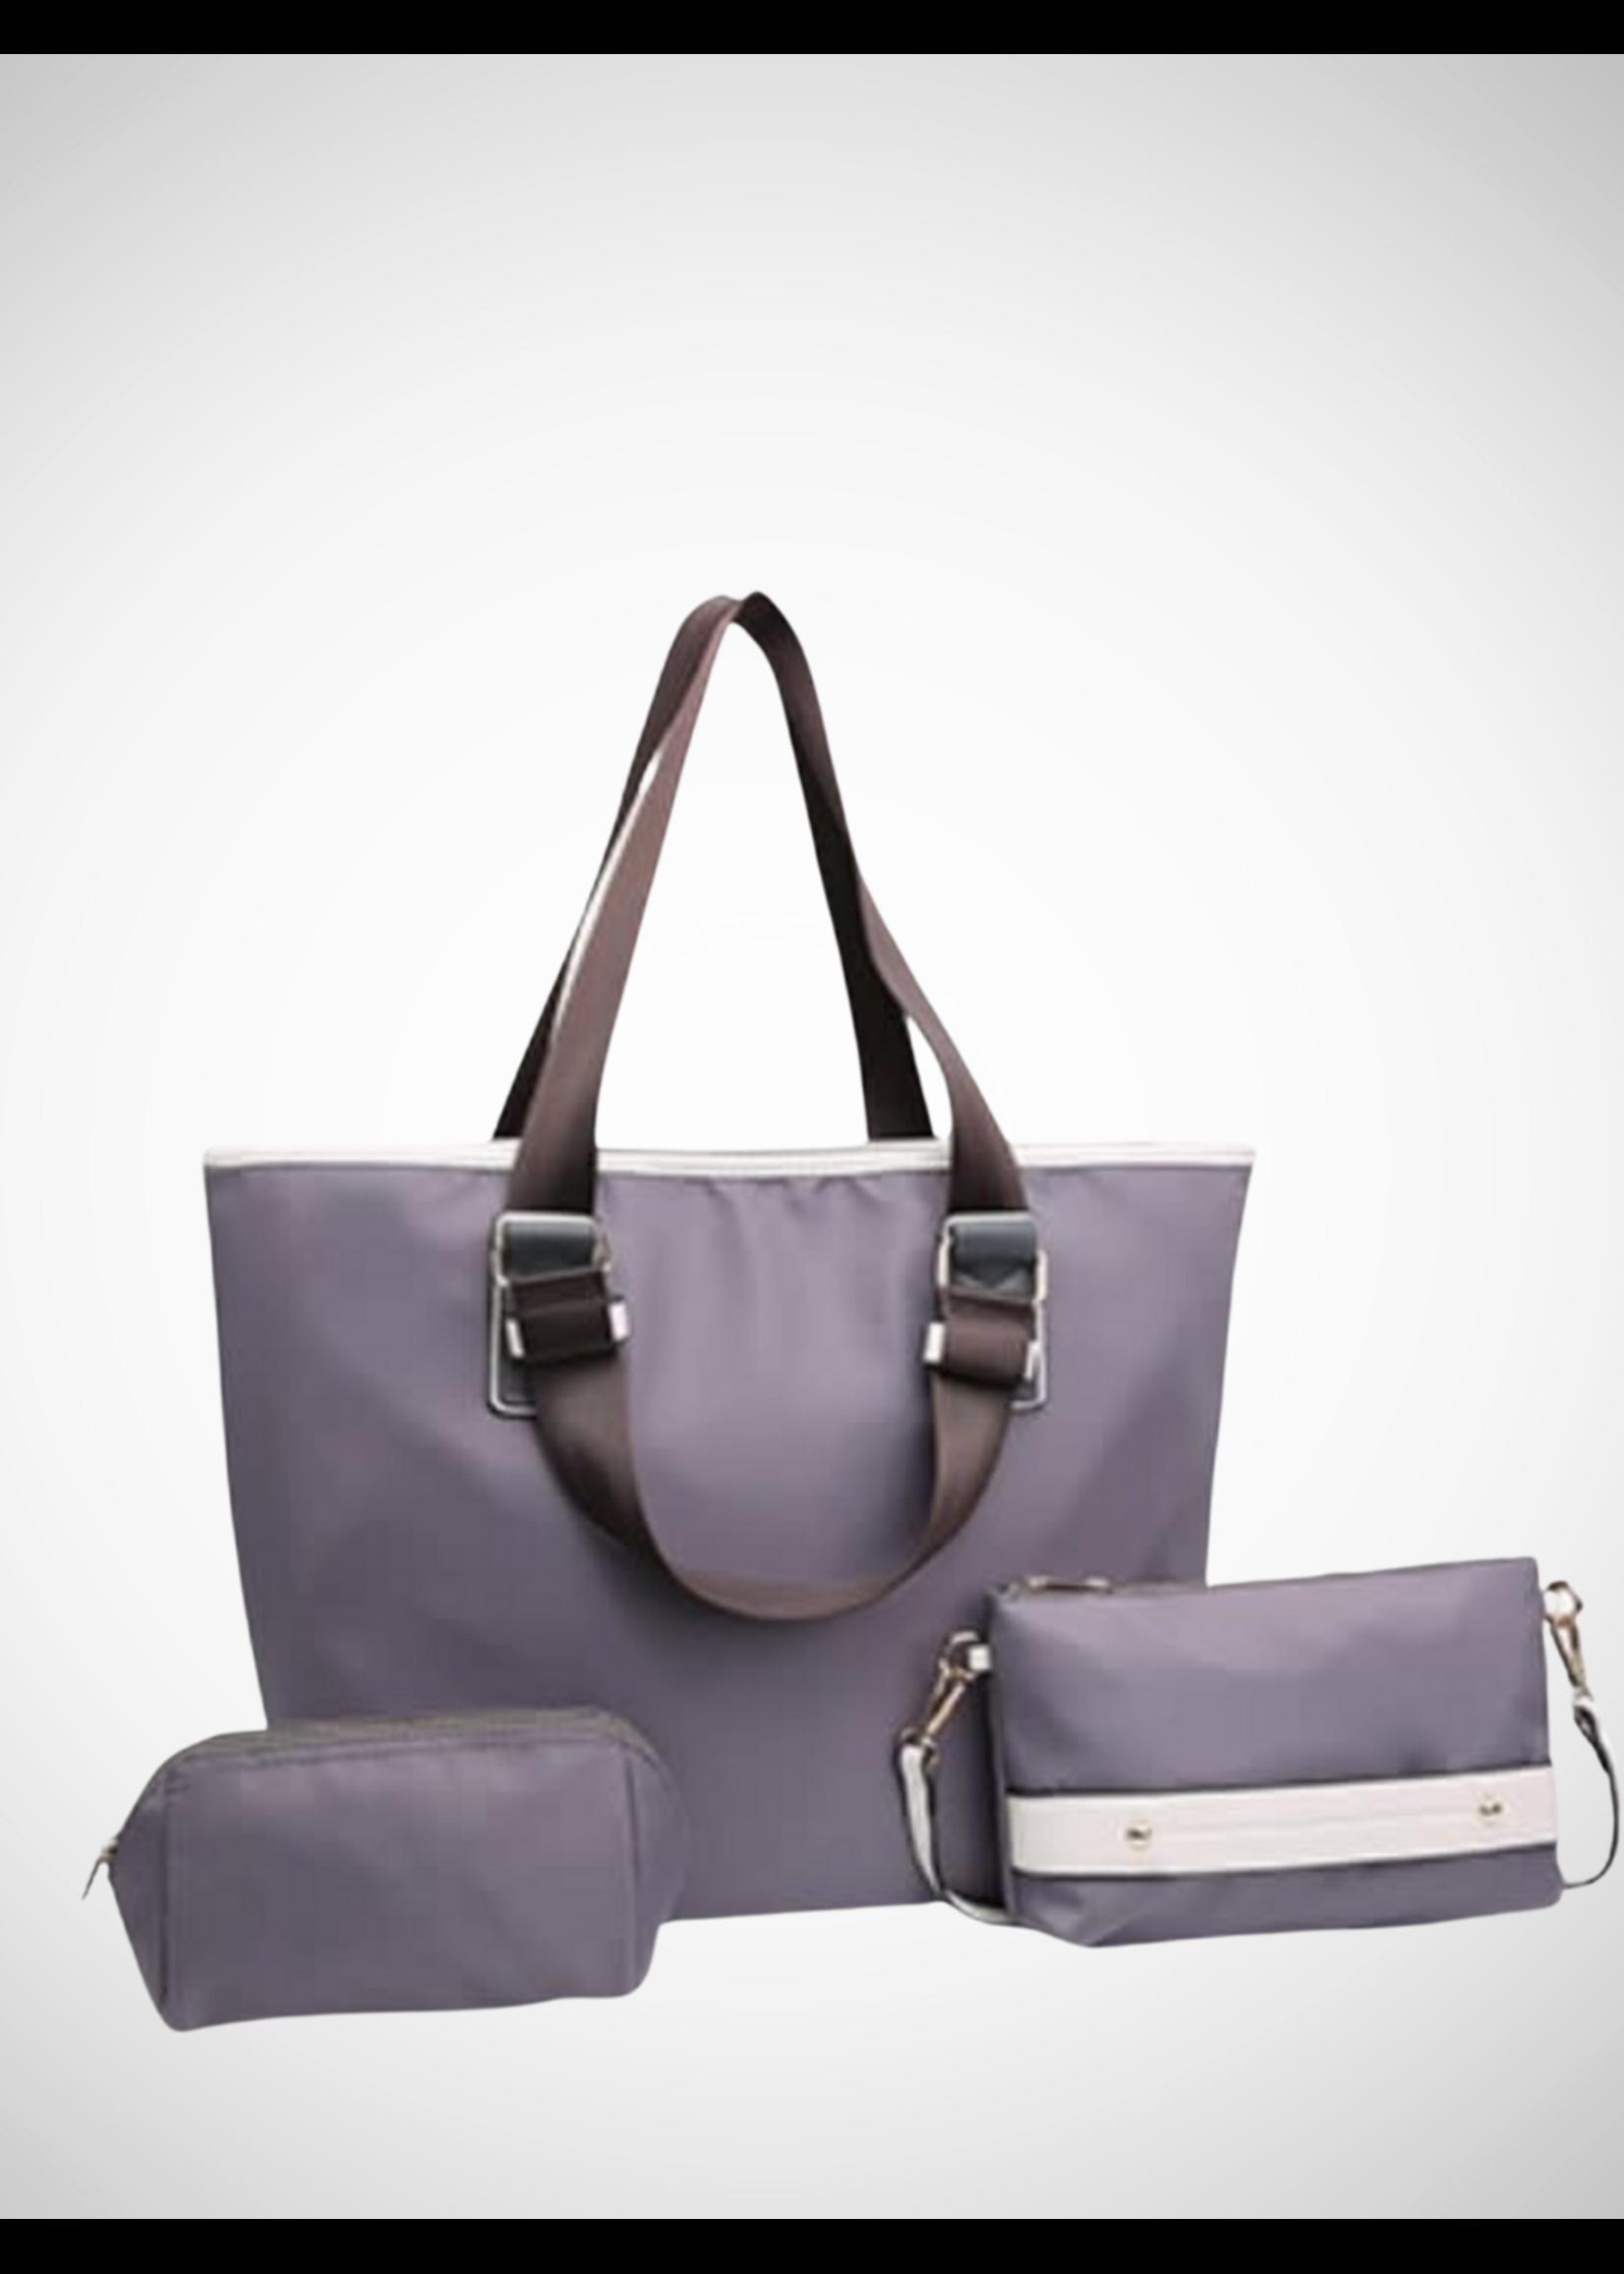 KDX Sturdy Nylon Fashion Tote 3pc Set